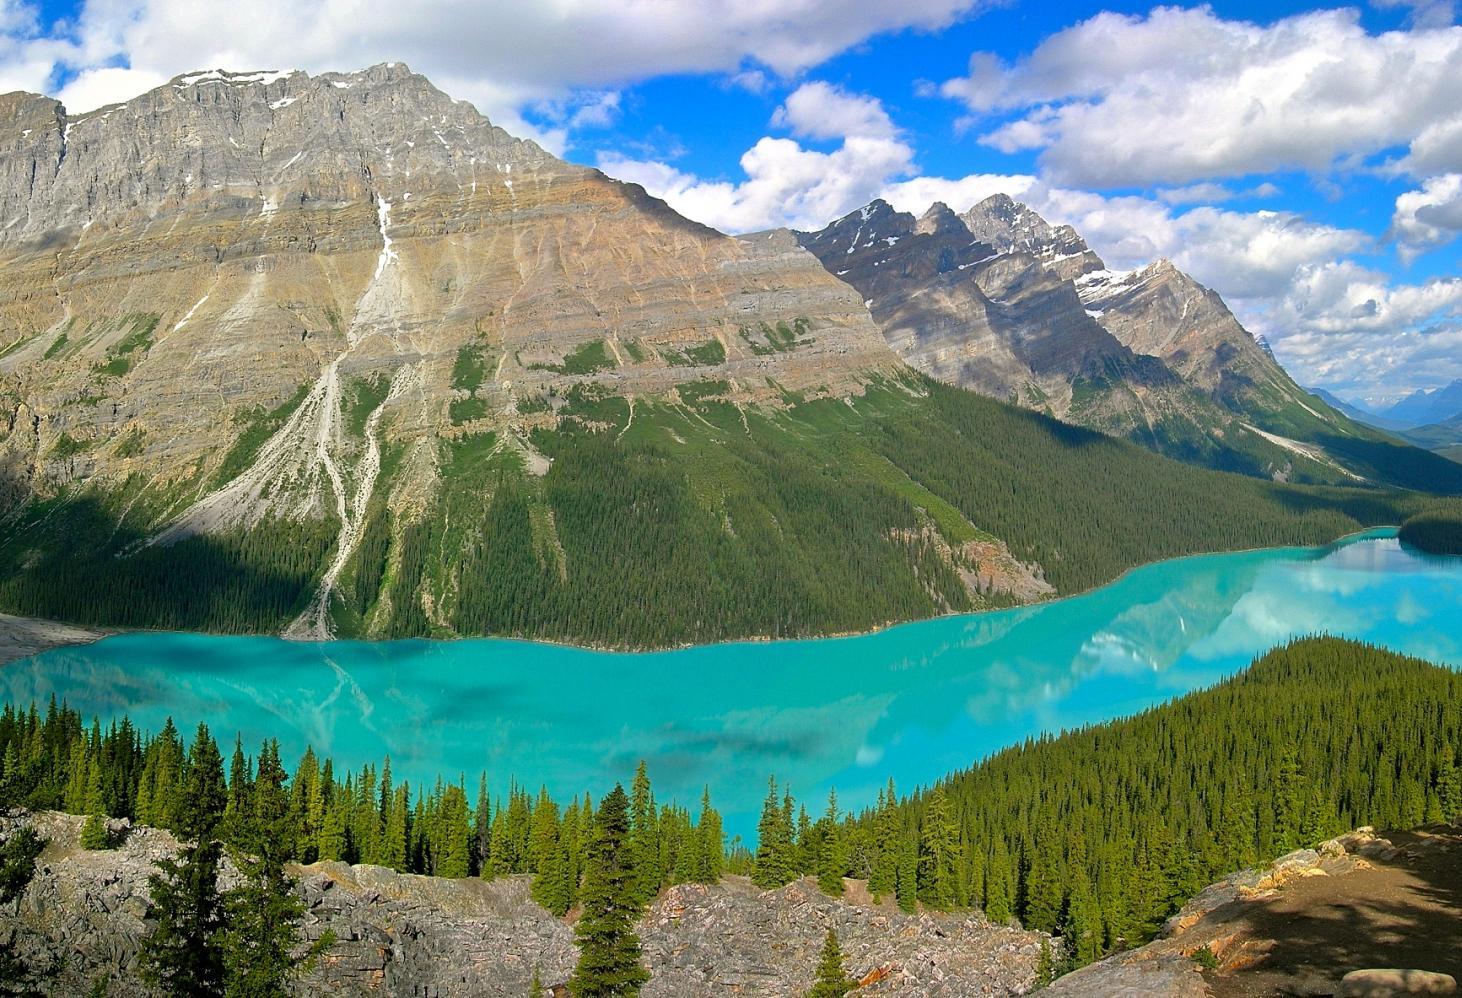 Озеро Пейто (Peyto Lake), Канада.